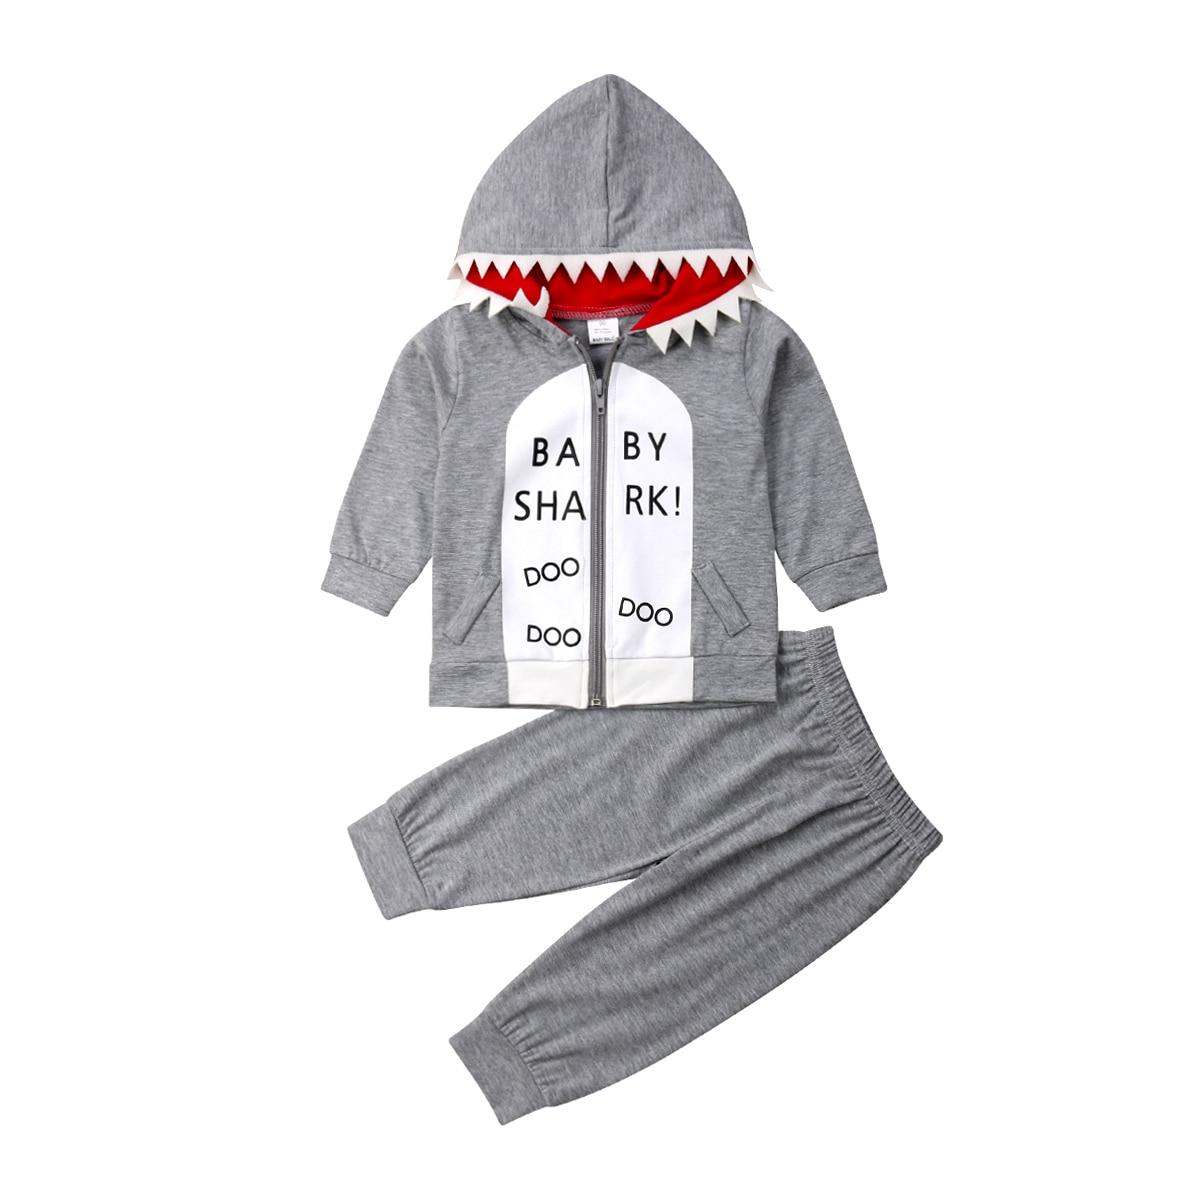 2PCS Toddler Baby Boy Girl Sweatshirts Hoodies Pants Legging Outfit Clothes Set